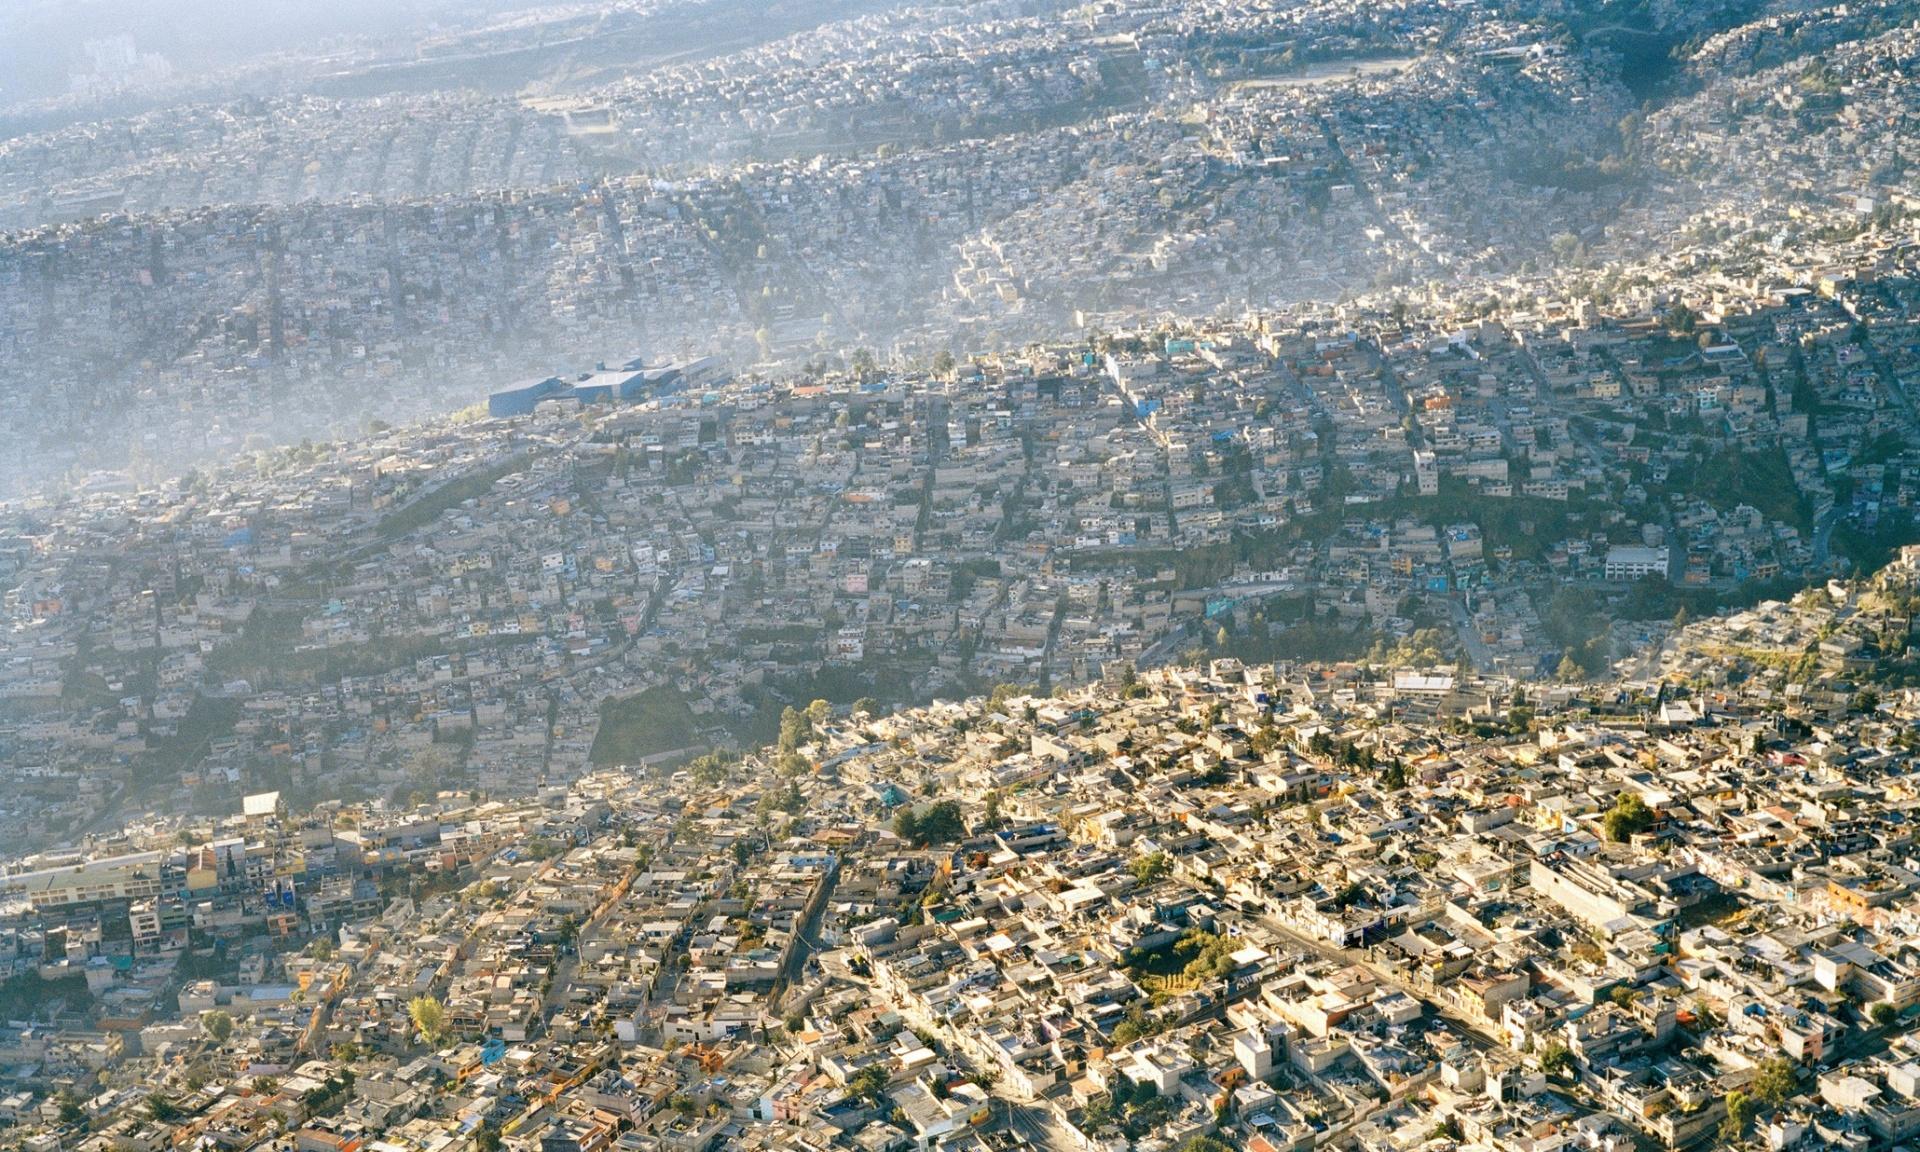 Suburbs of Mexico City